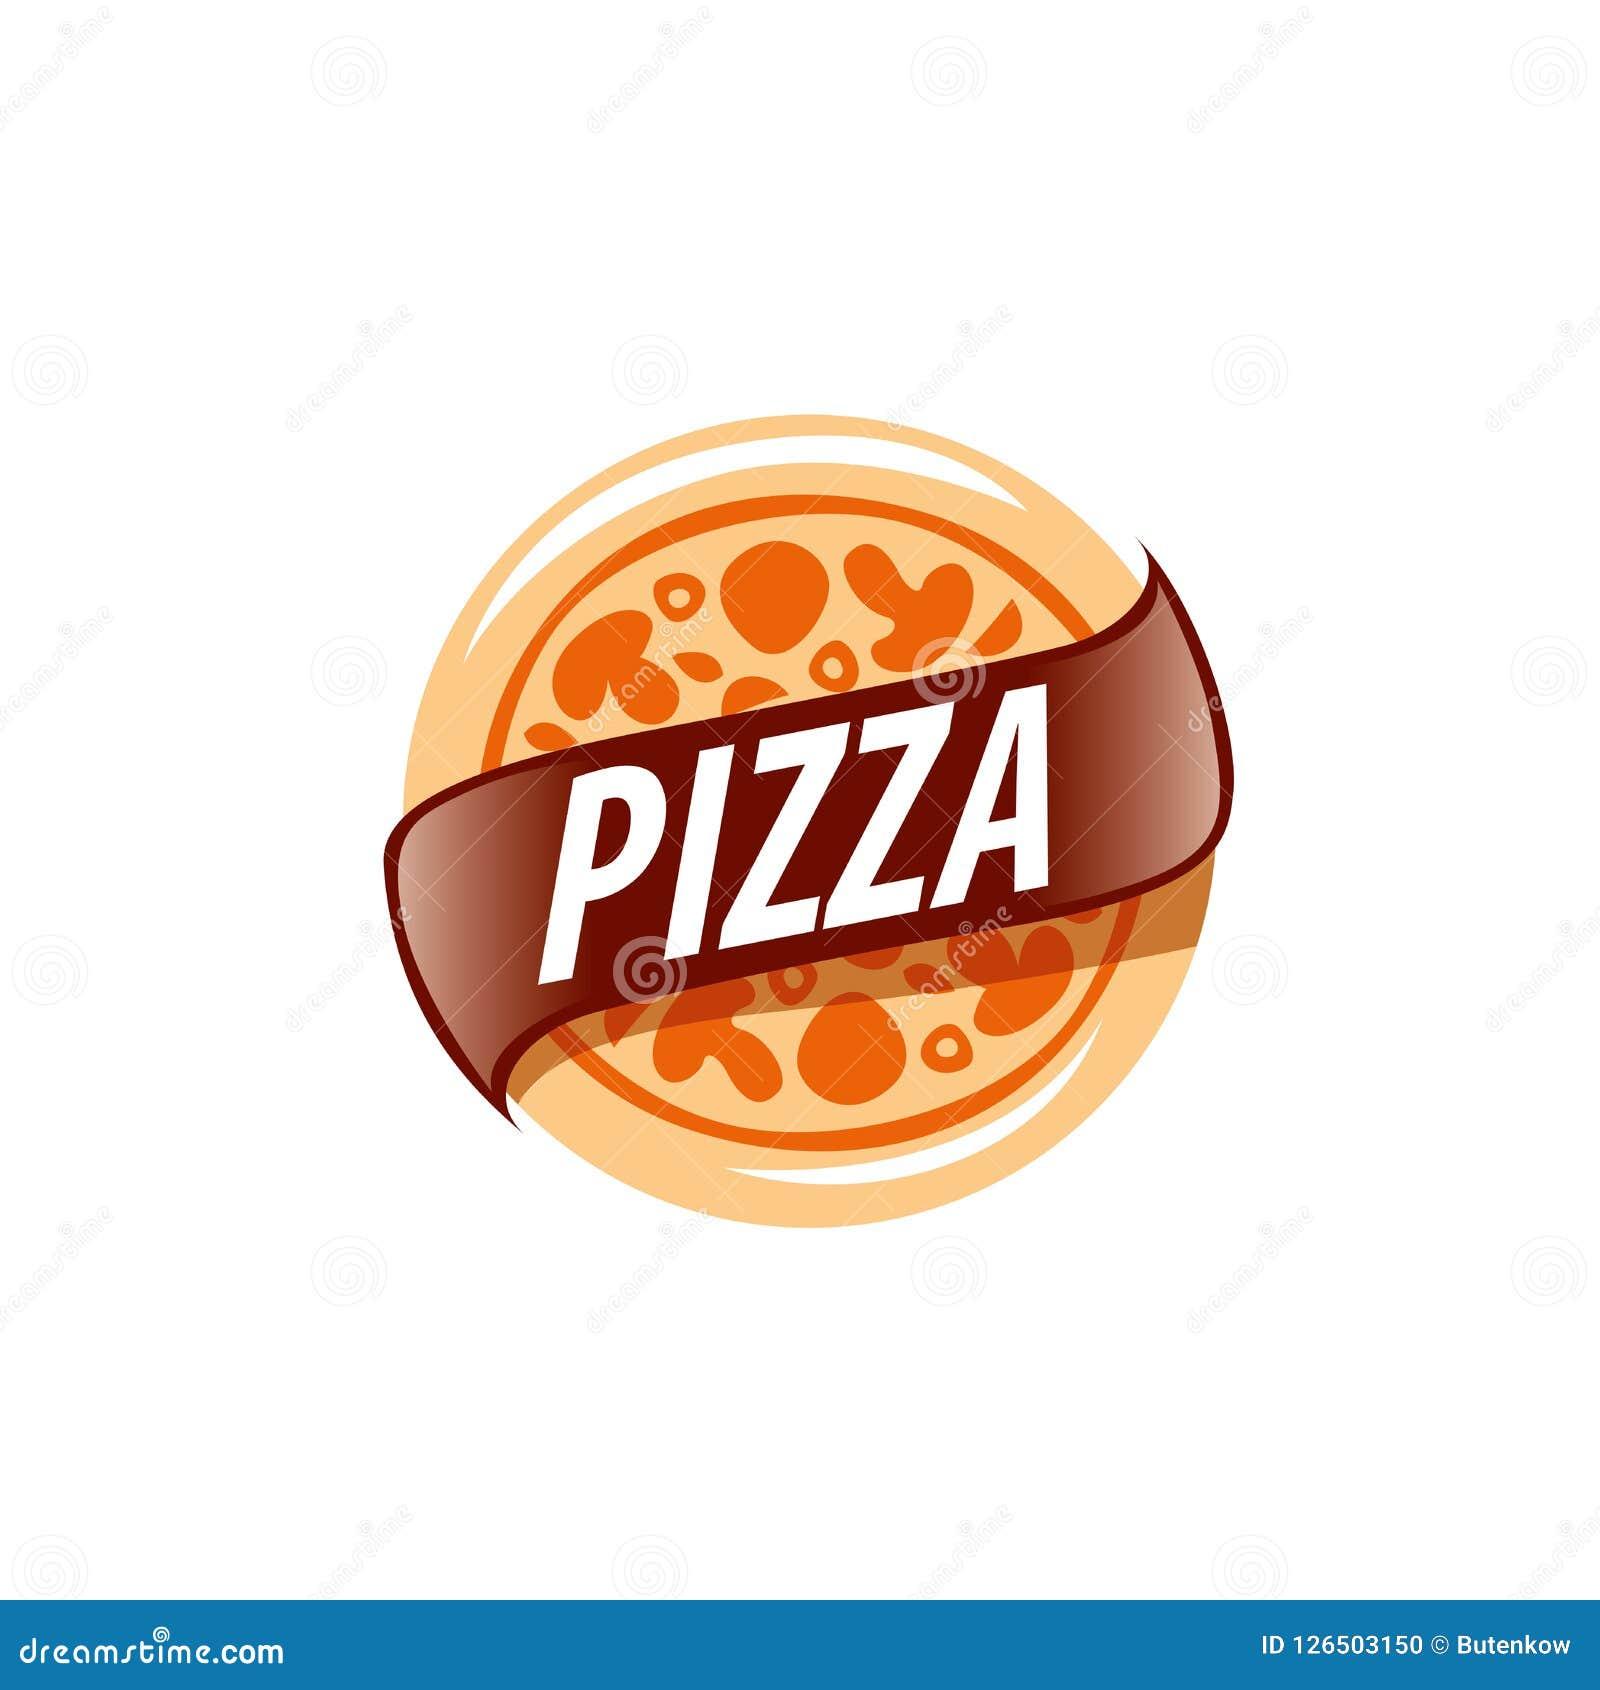 Pizza vector logo stock vector  Illustration of badge - 126503150